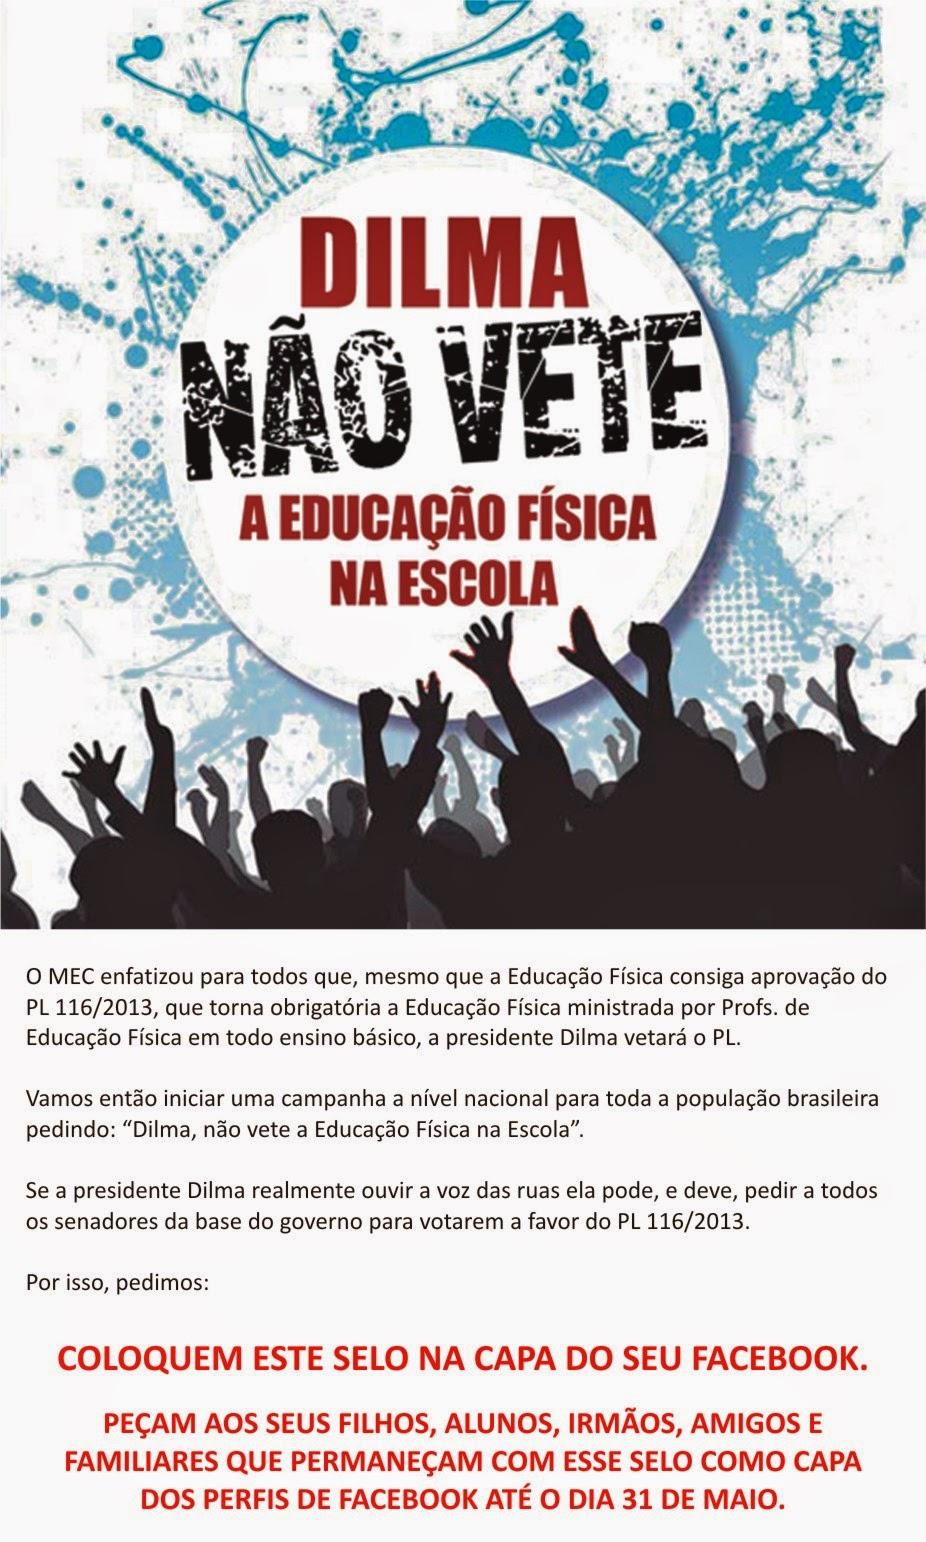 http://cref1.org.br/noticias.php?id=824